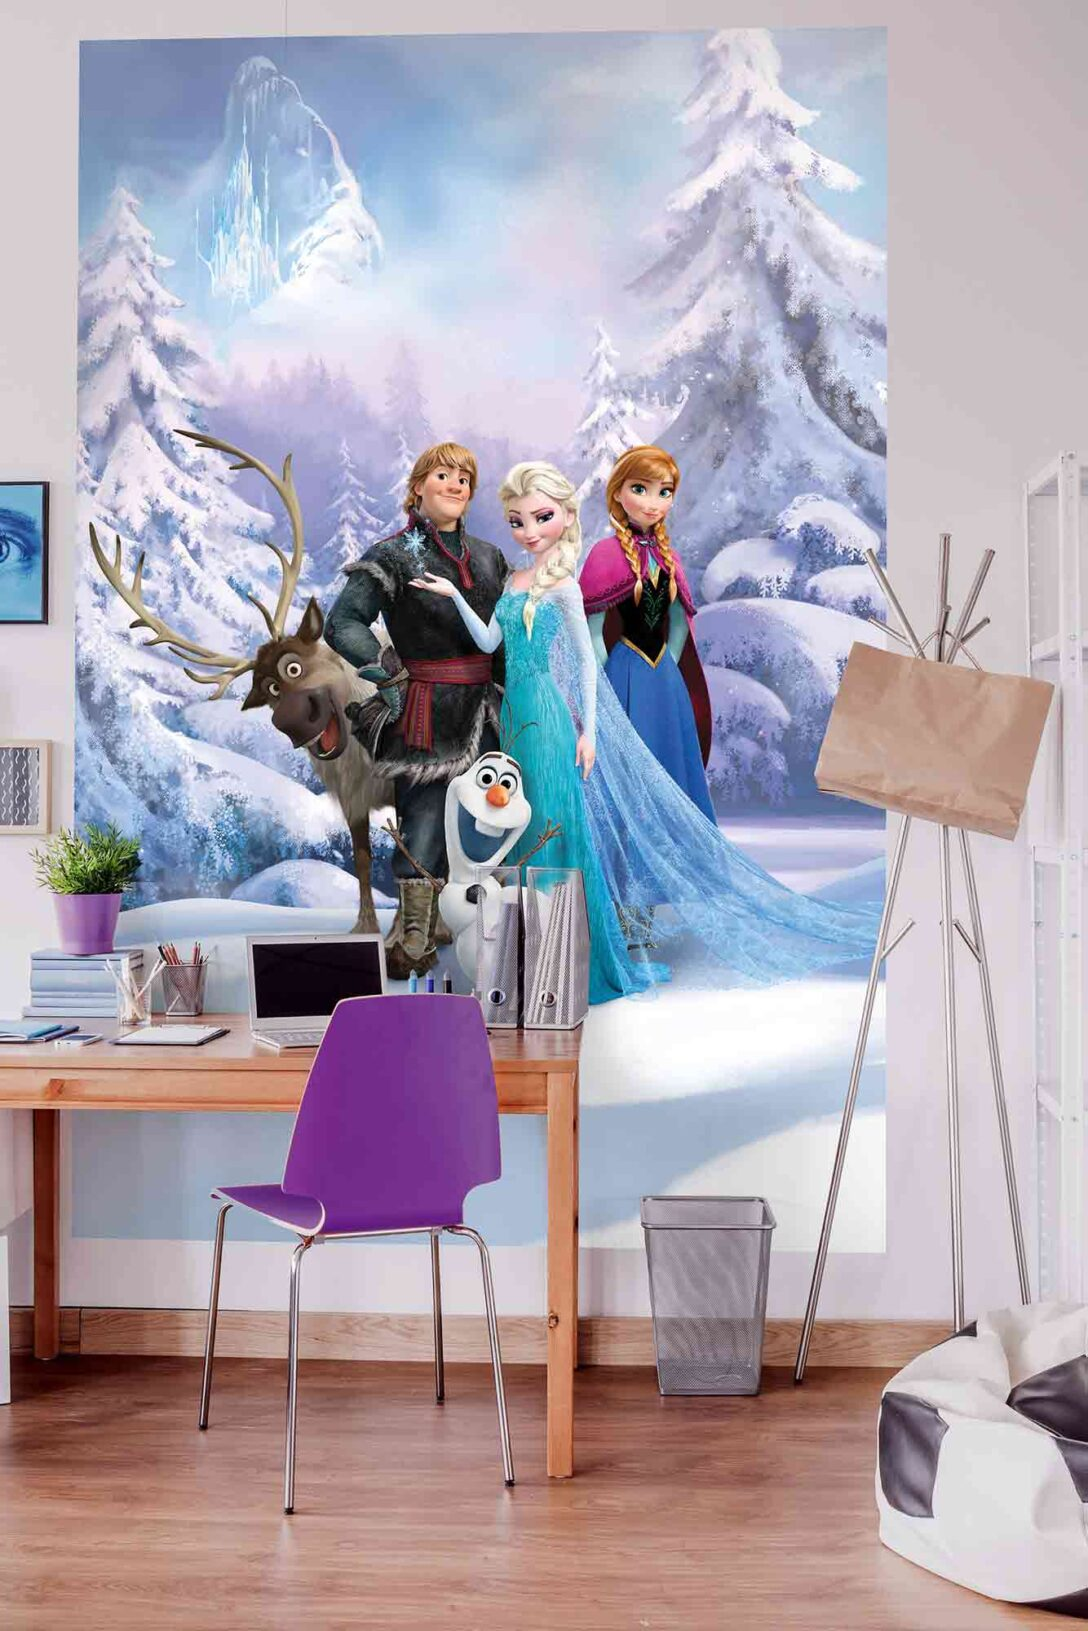 Large Size of Tapeten Kinderzimmer Disney Elsa Frozen Forest Winter Land Fototapete Kindertapeten Regal Weiß Wohnzimmer Ideen Fototapeten Sofa Für Die Küche Regale Kinderzimmer Tapeten Kinderzimmer